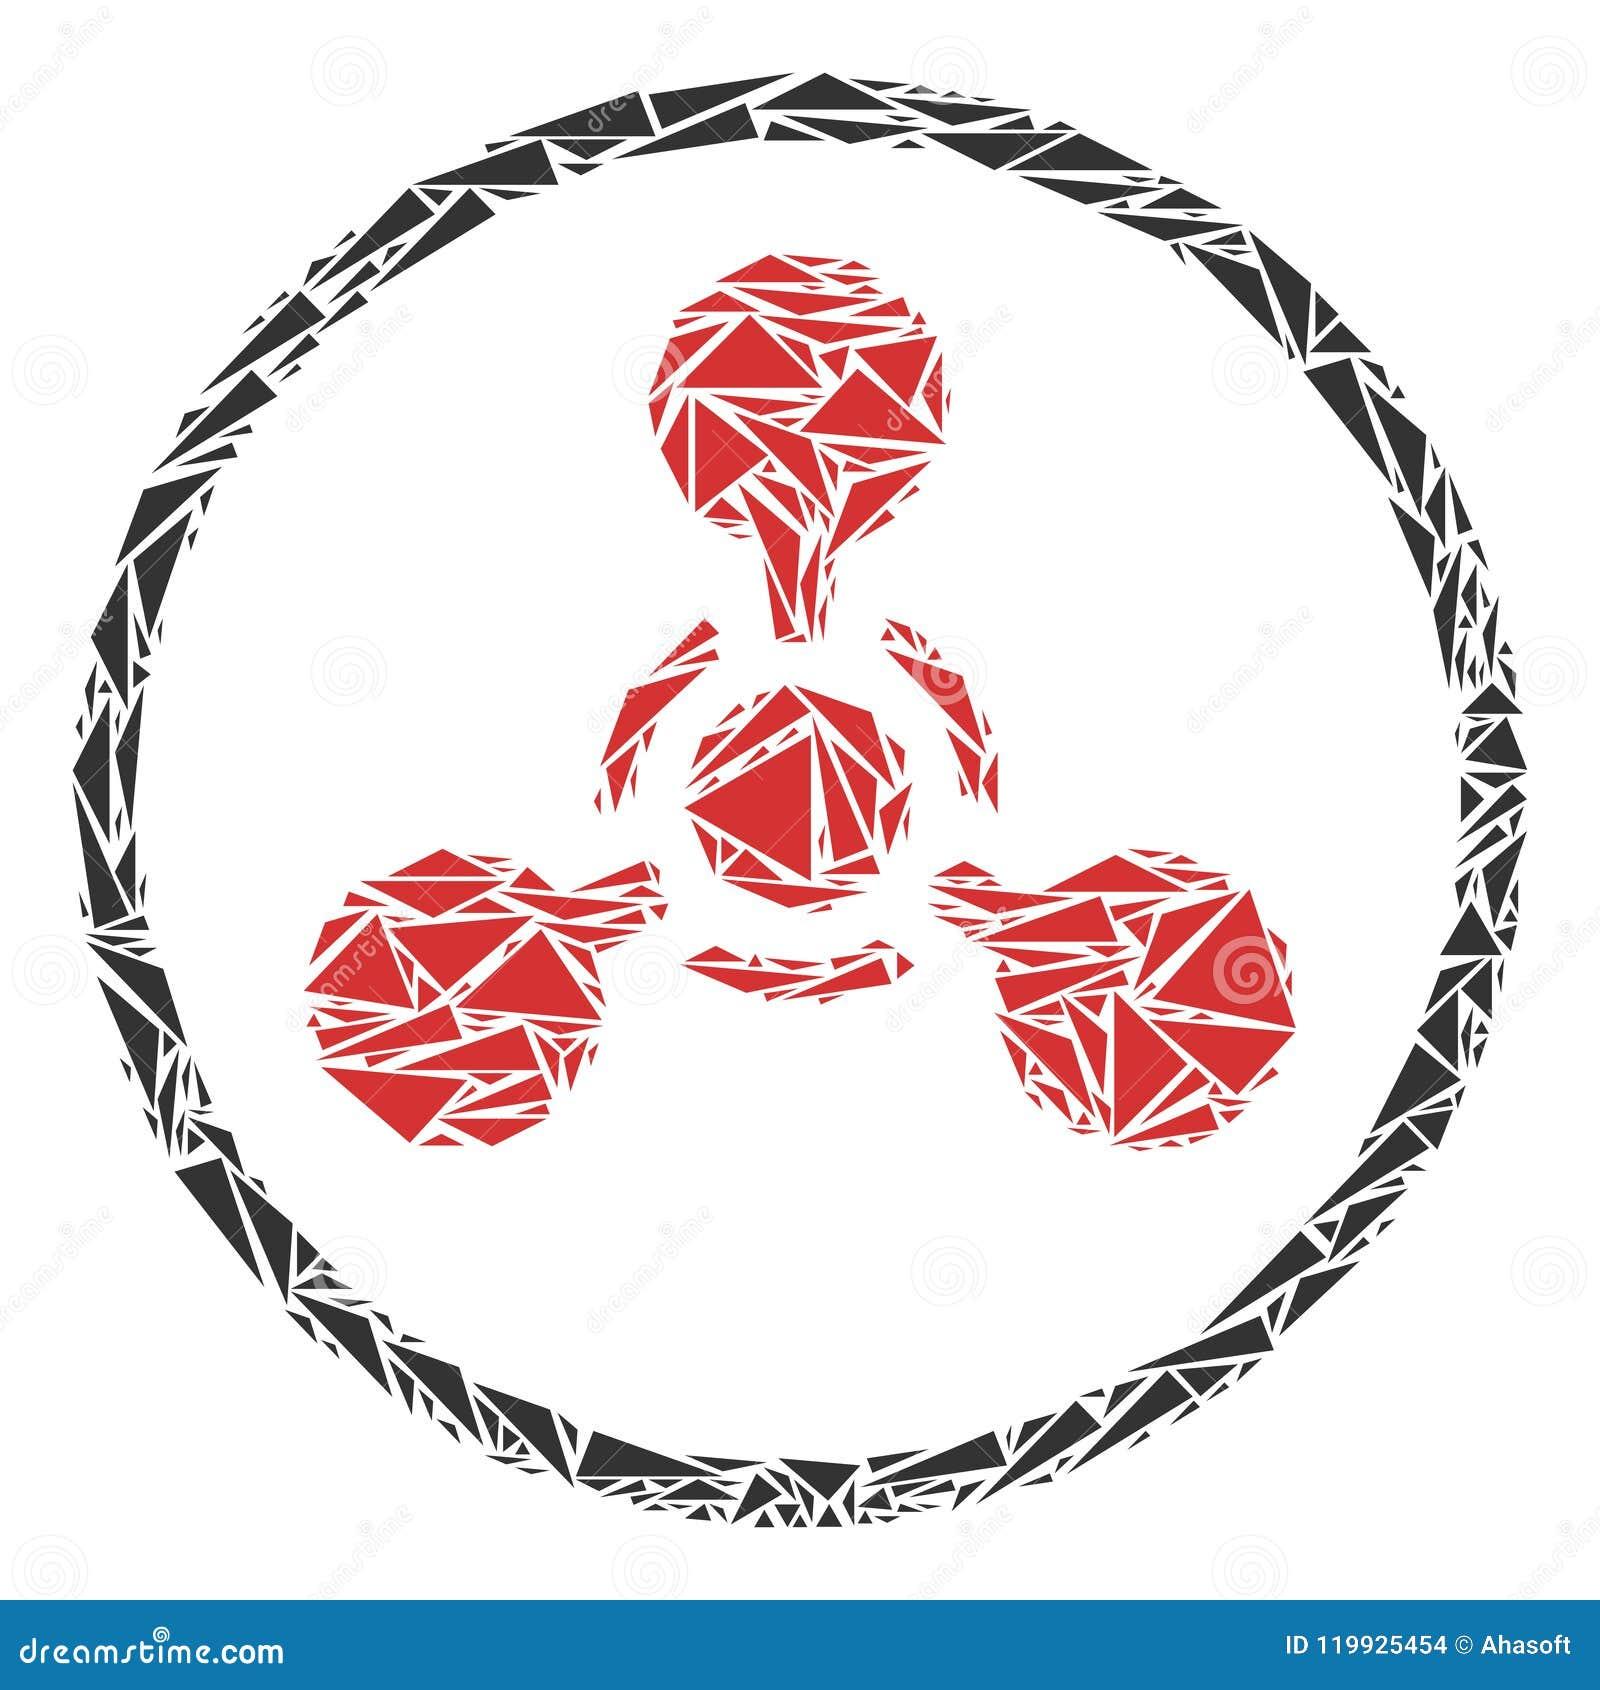 Agente de nervio de WMD Chemical Warfare Collage de triángulos